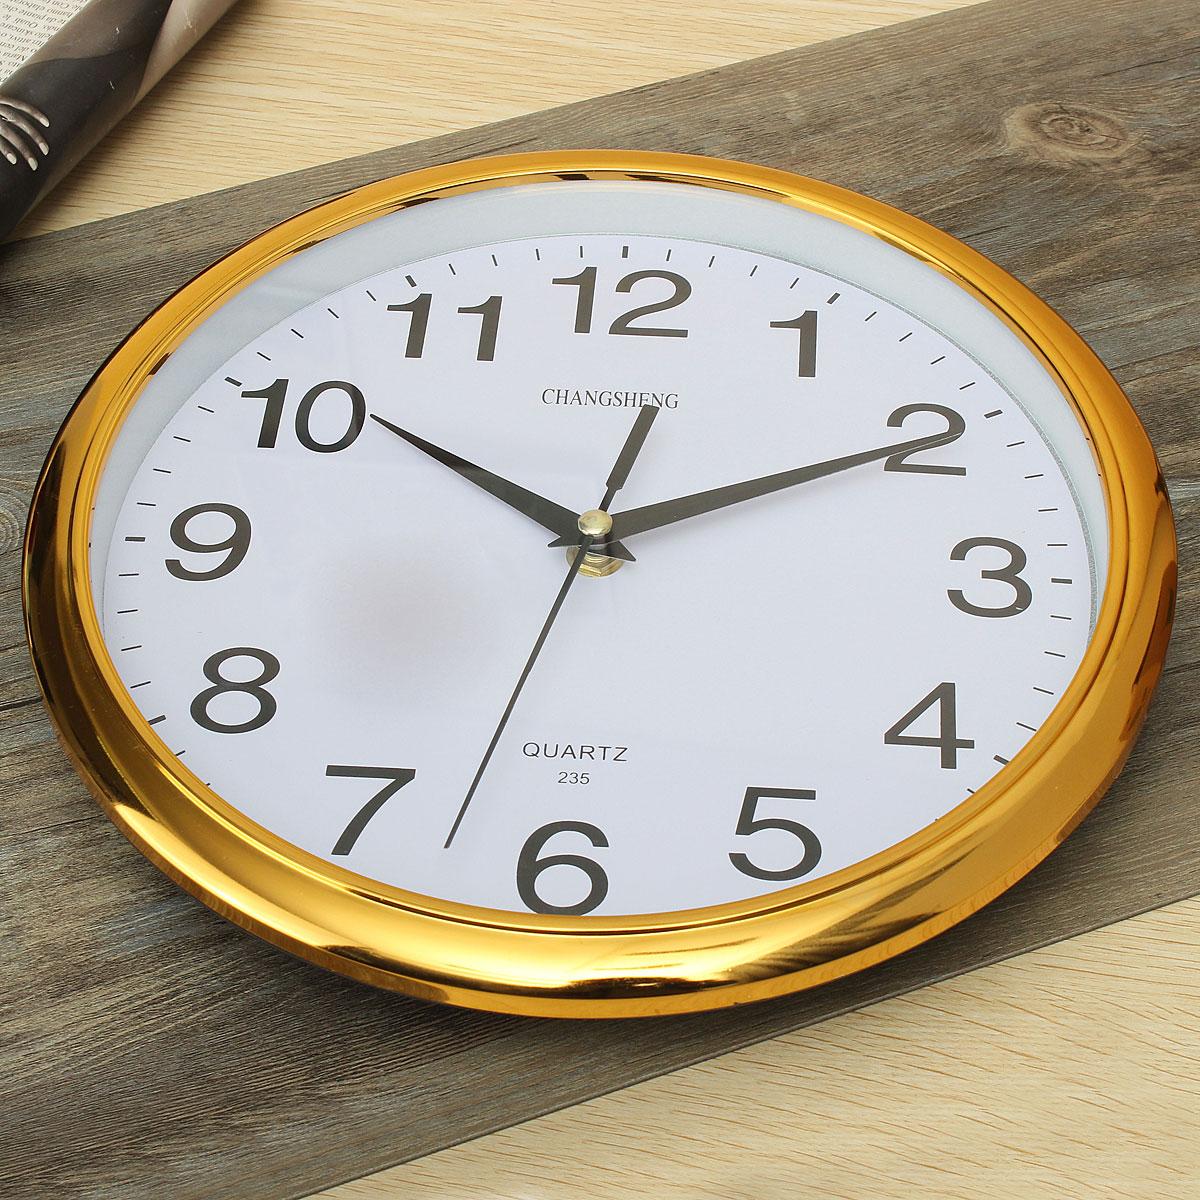 Retro Kitchen Wall Clocks Large Vintage Round Modern Home Bedroom Retro Time Kitchen Wall